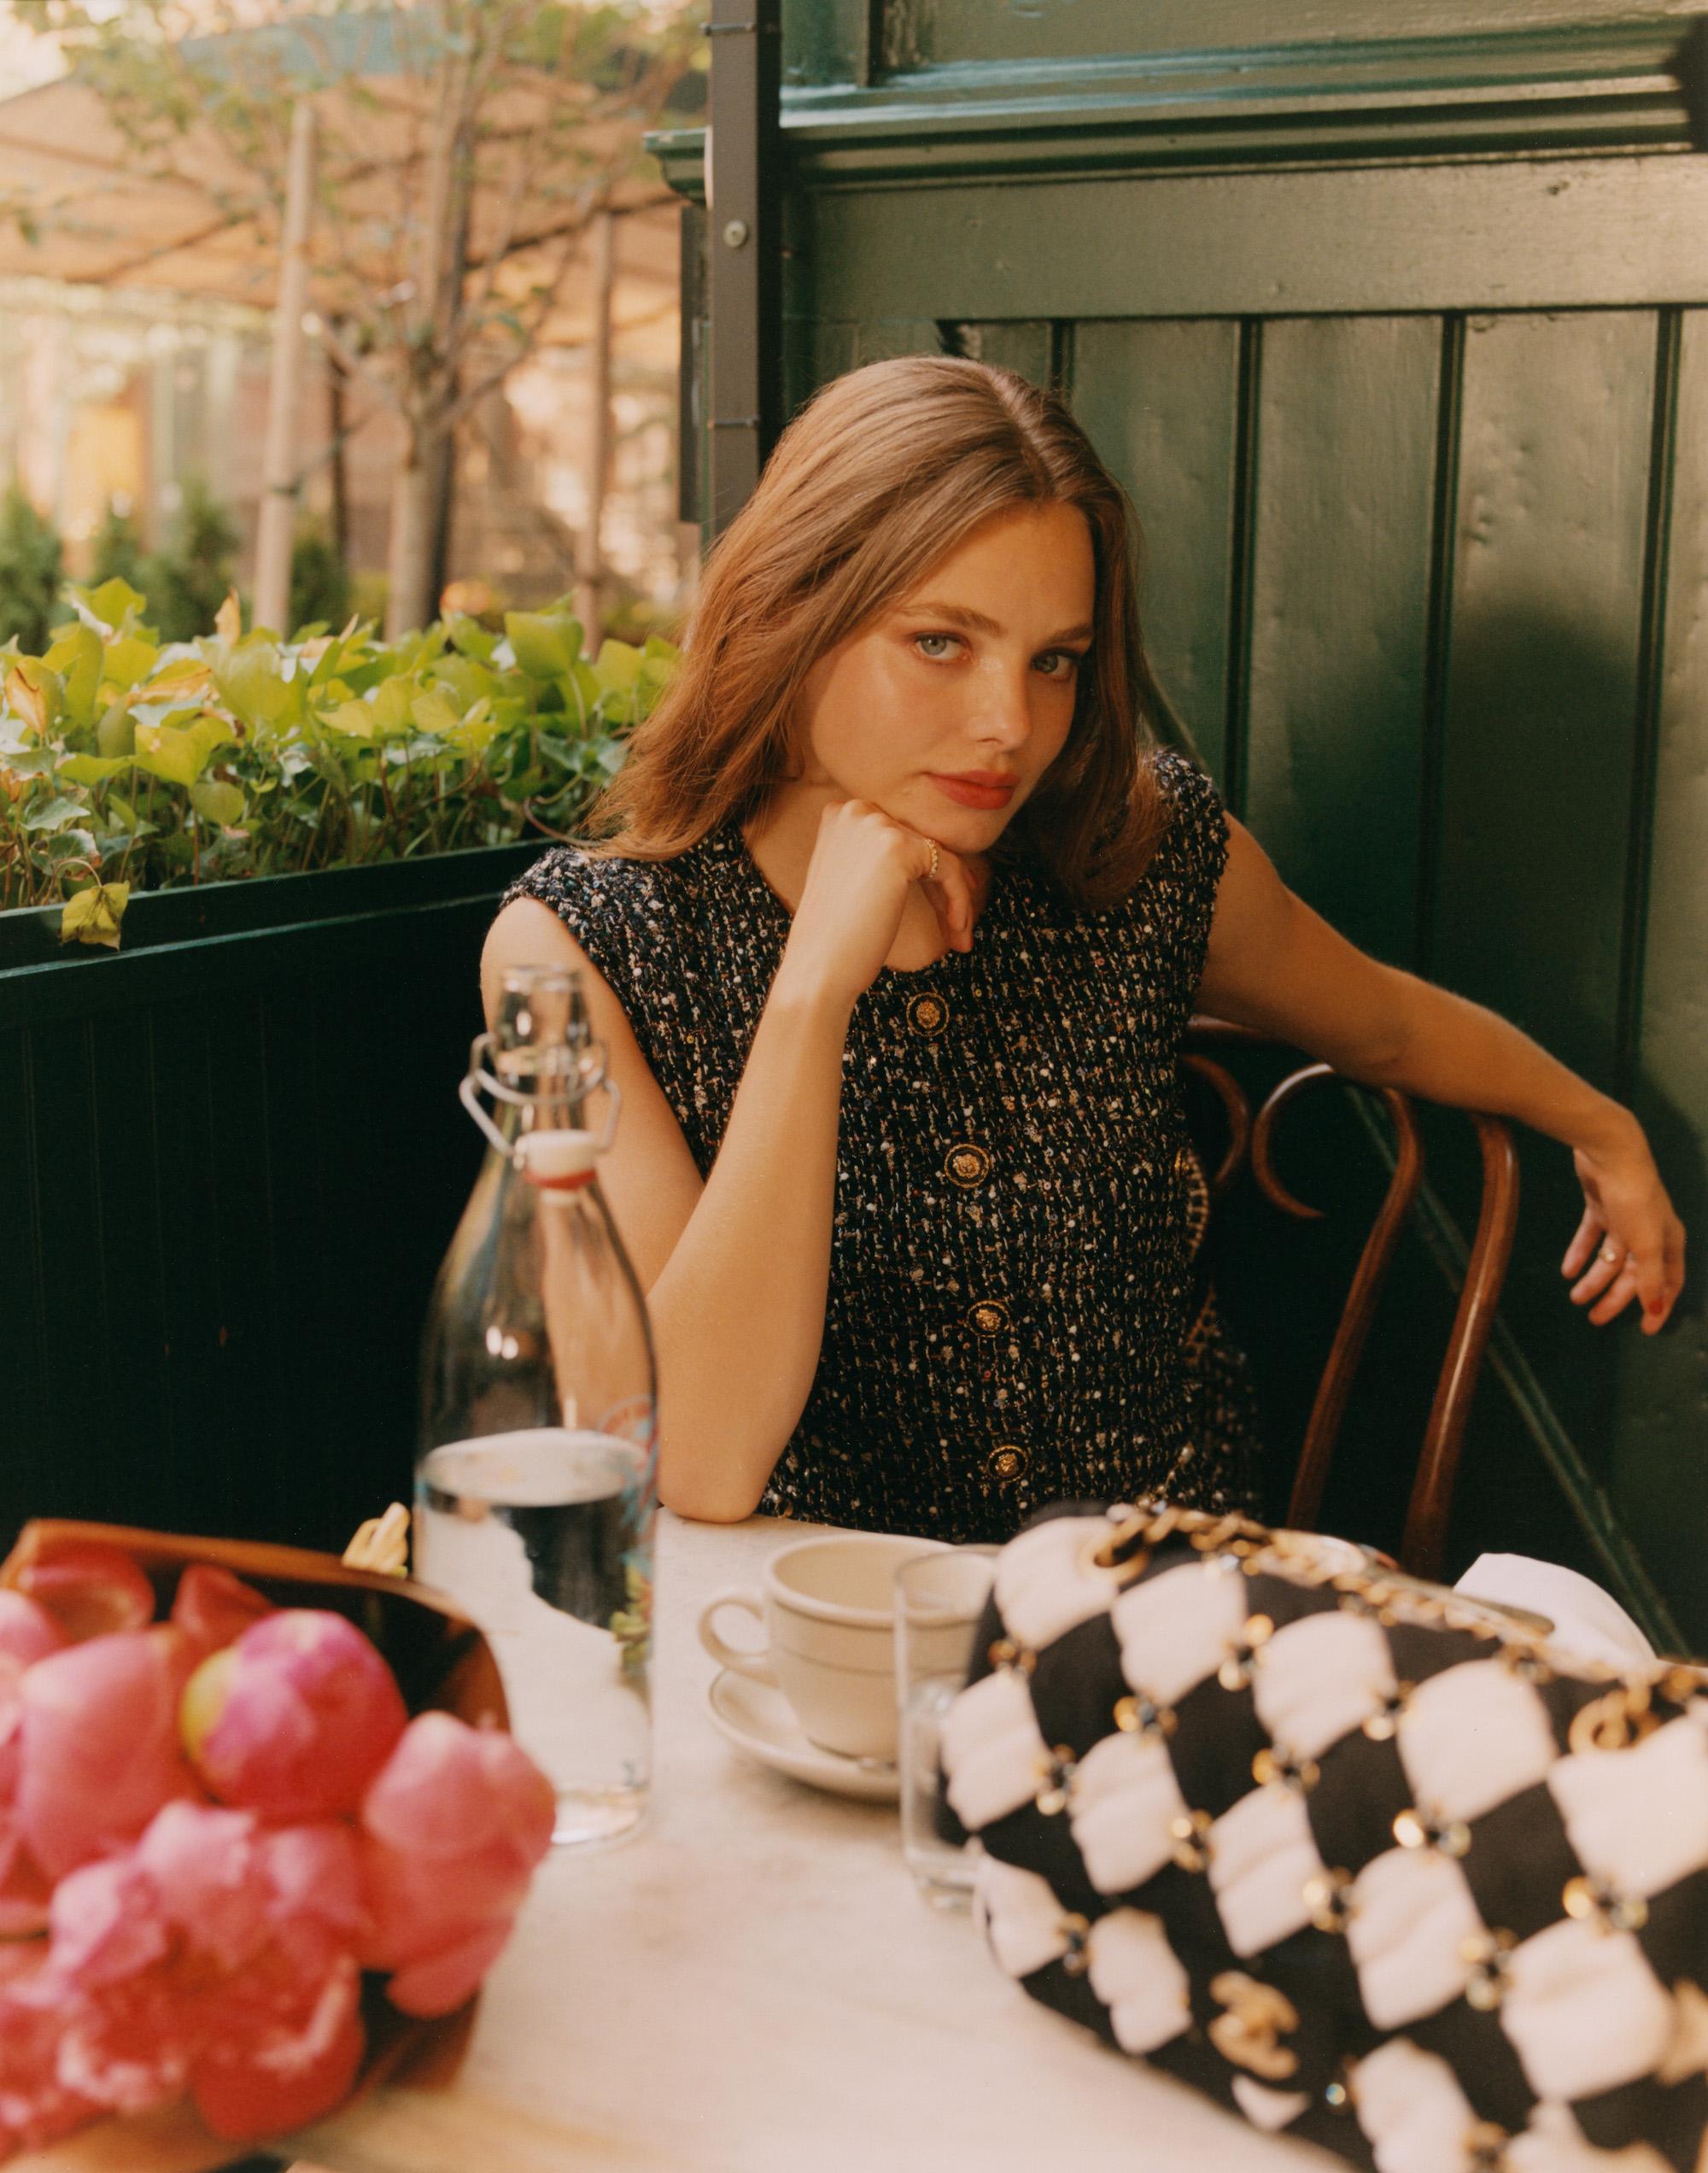 Kristine Froseth for ELLE Magazine